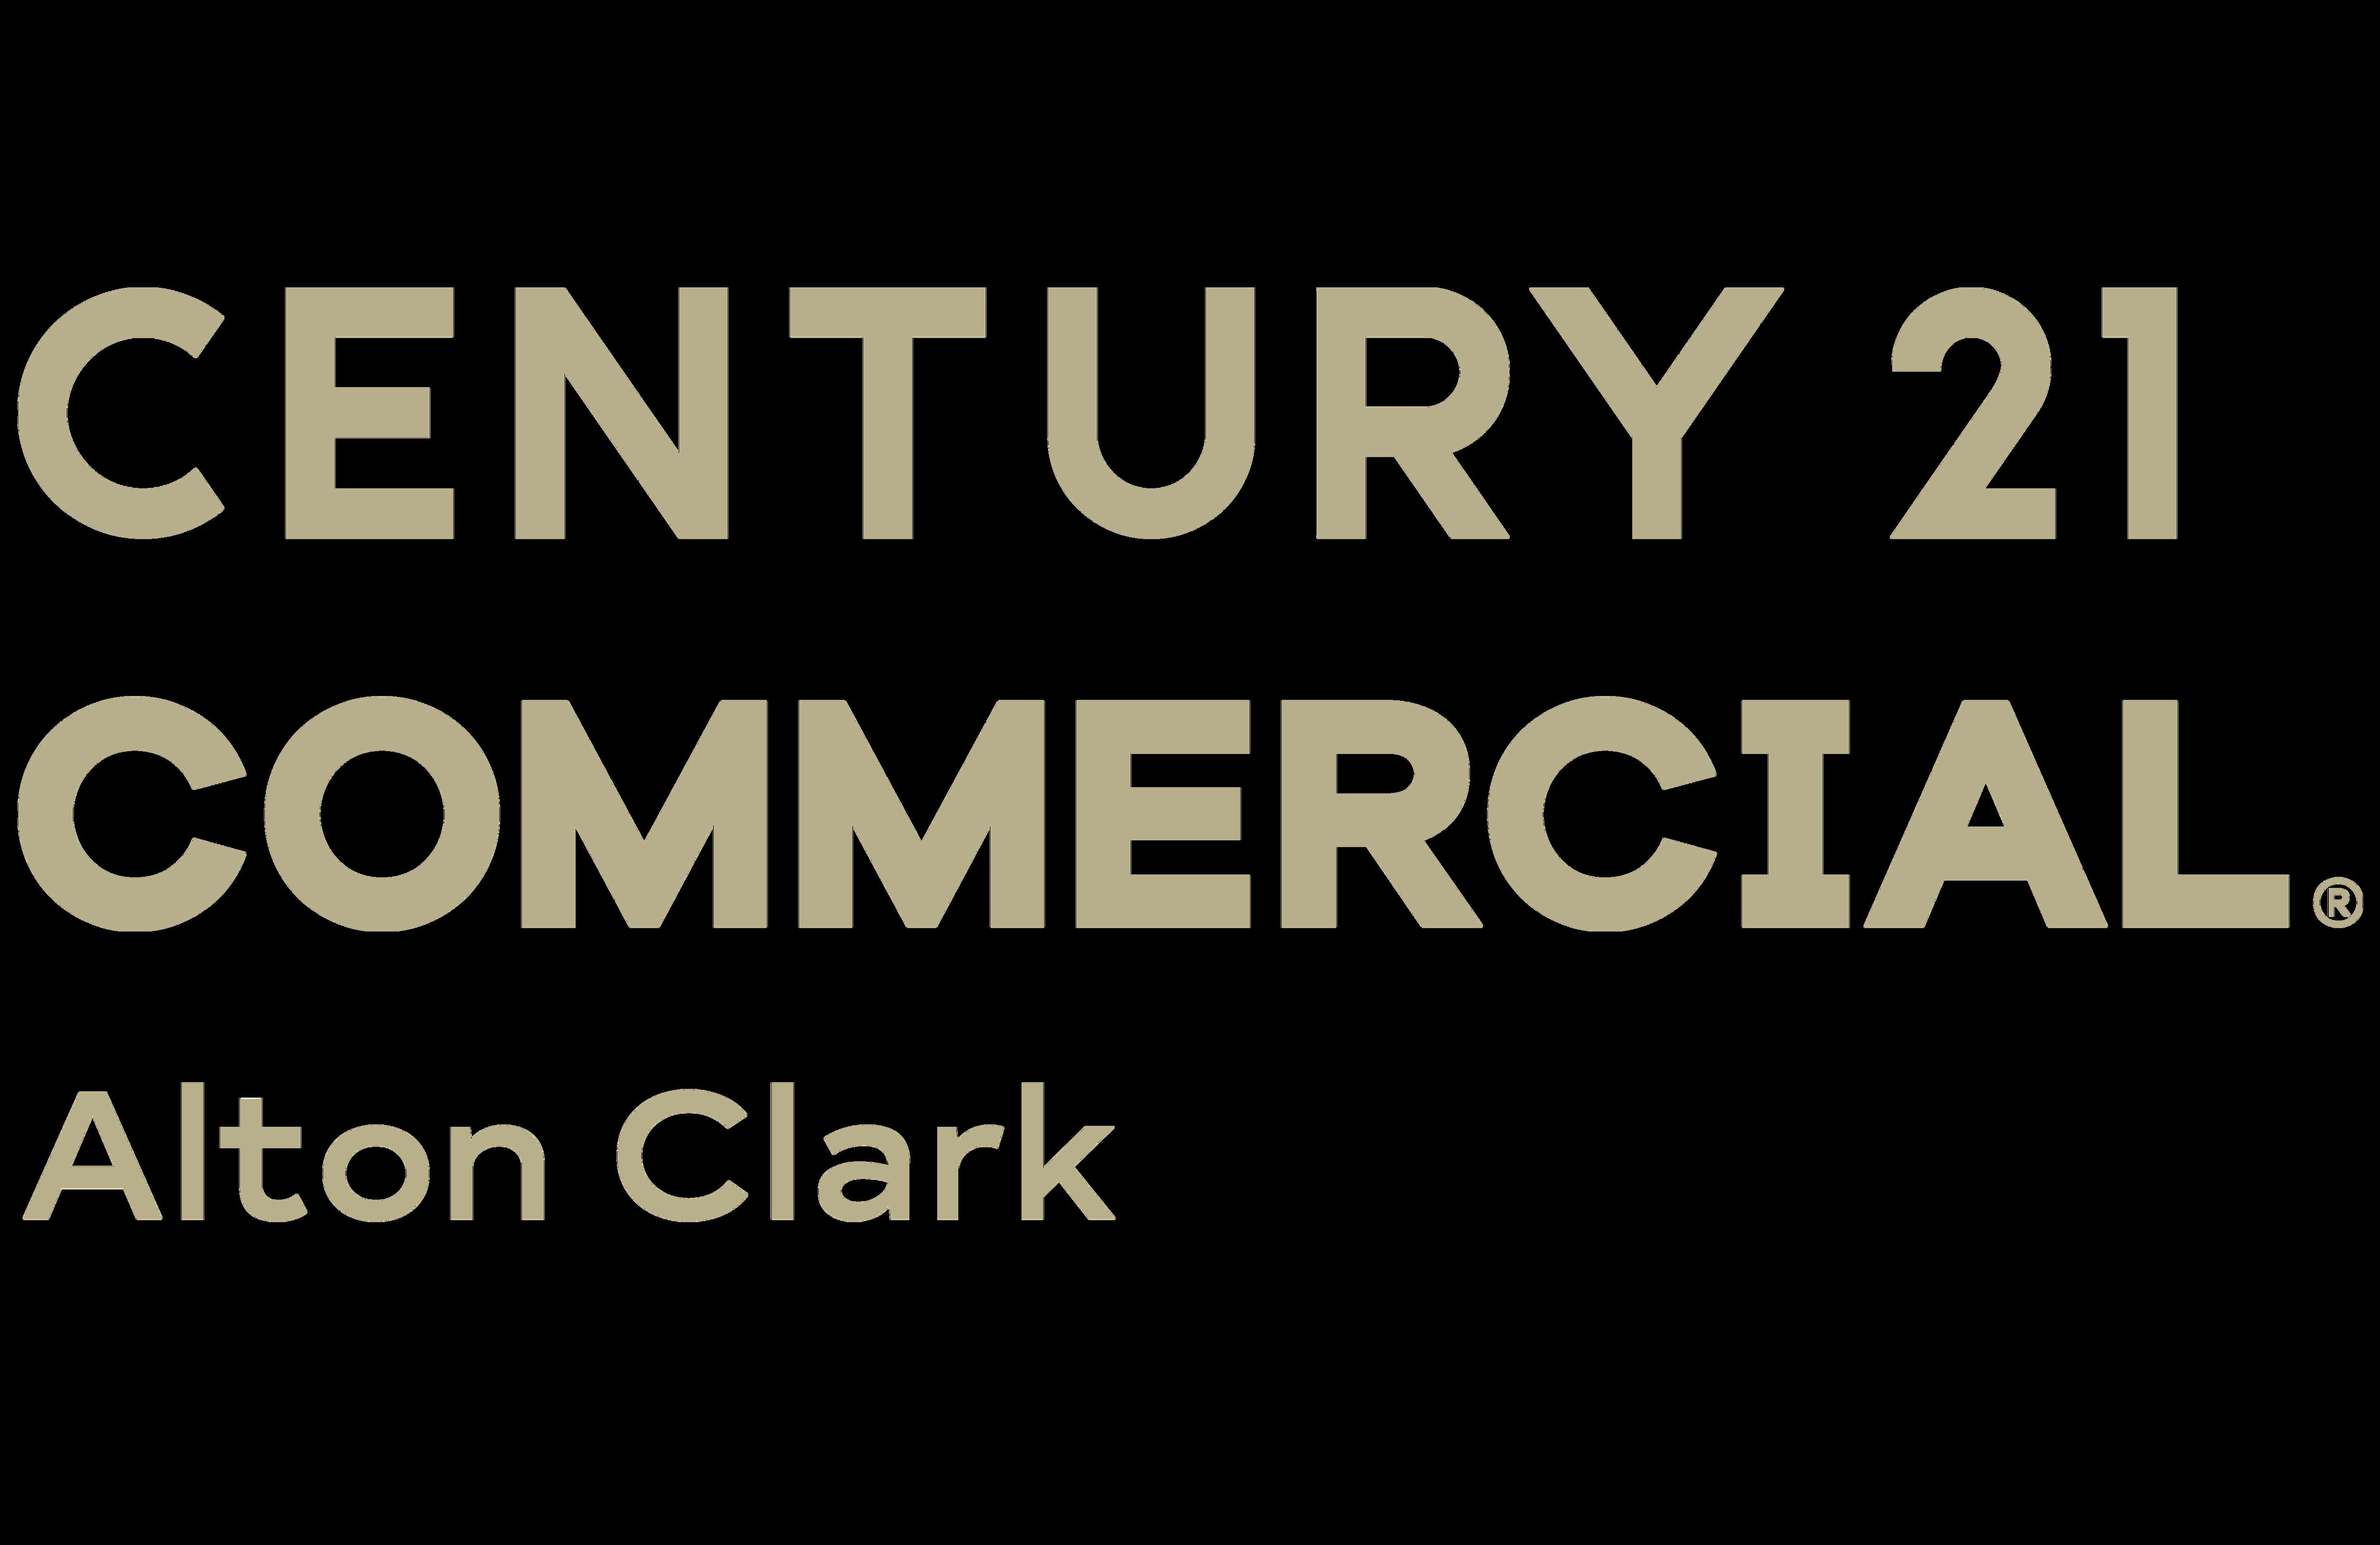 CENTURY 21 Alton Clark